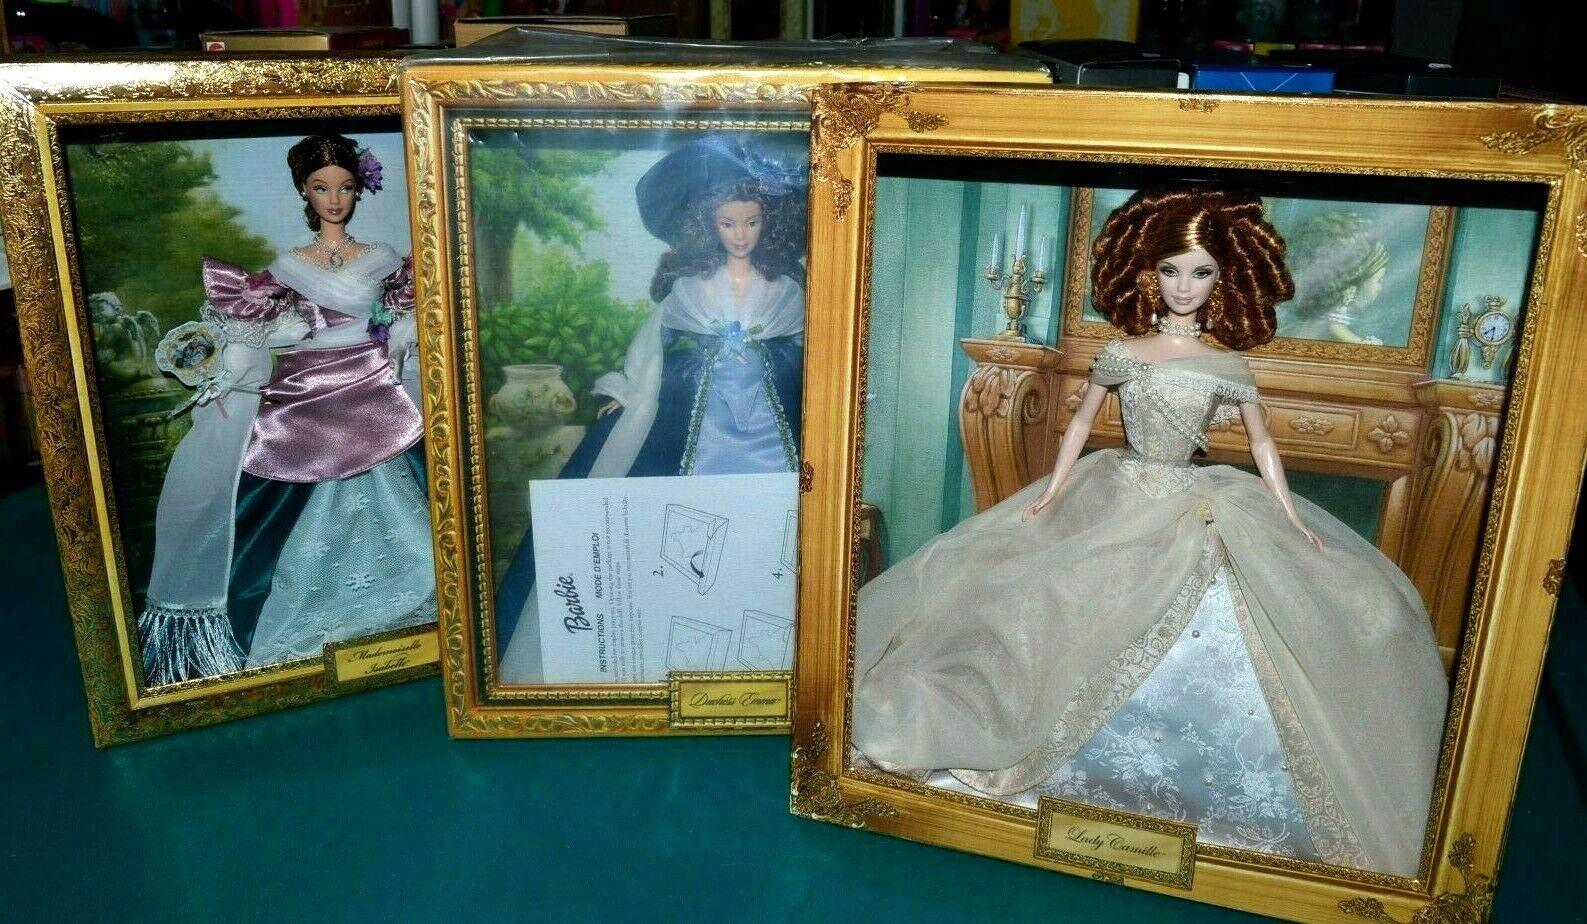 Nuevo En Caja-Lote de 3 Muñecas Barbie-duquesa Emma, Mademoiselle Isabelle, Lady Camille,